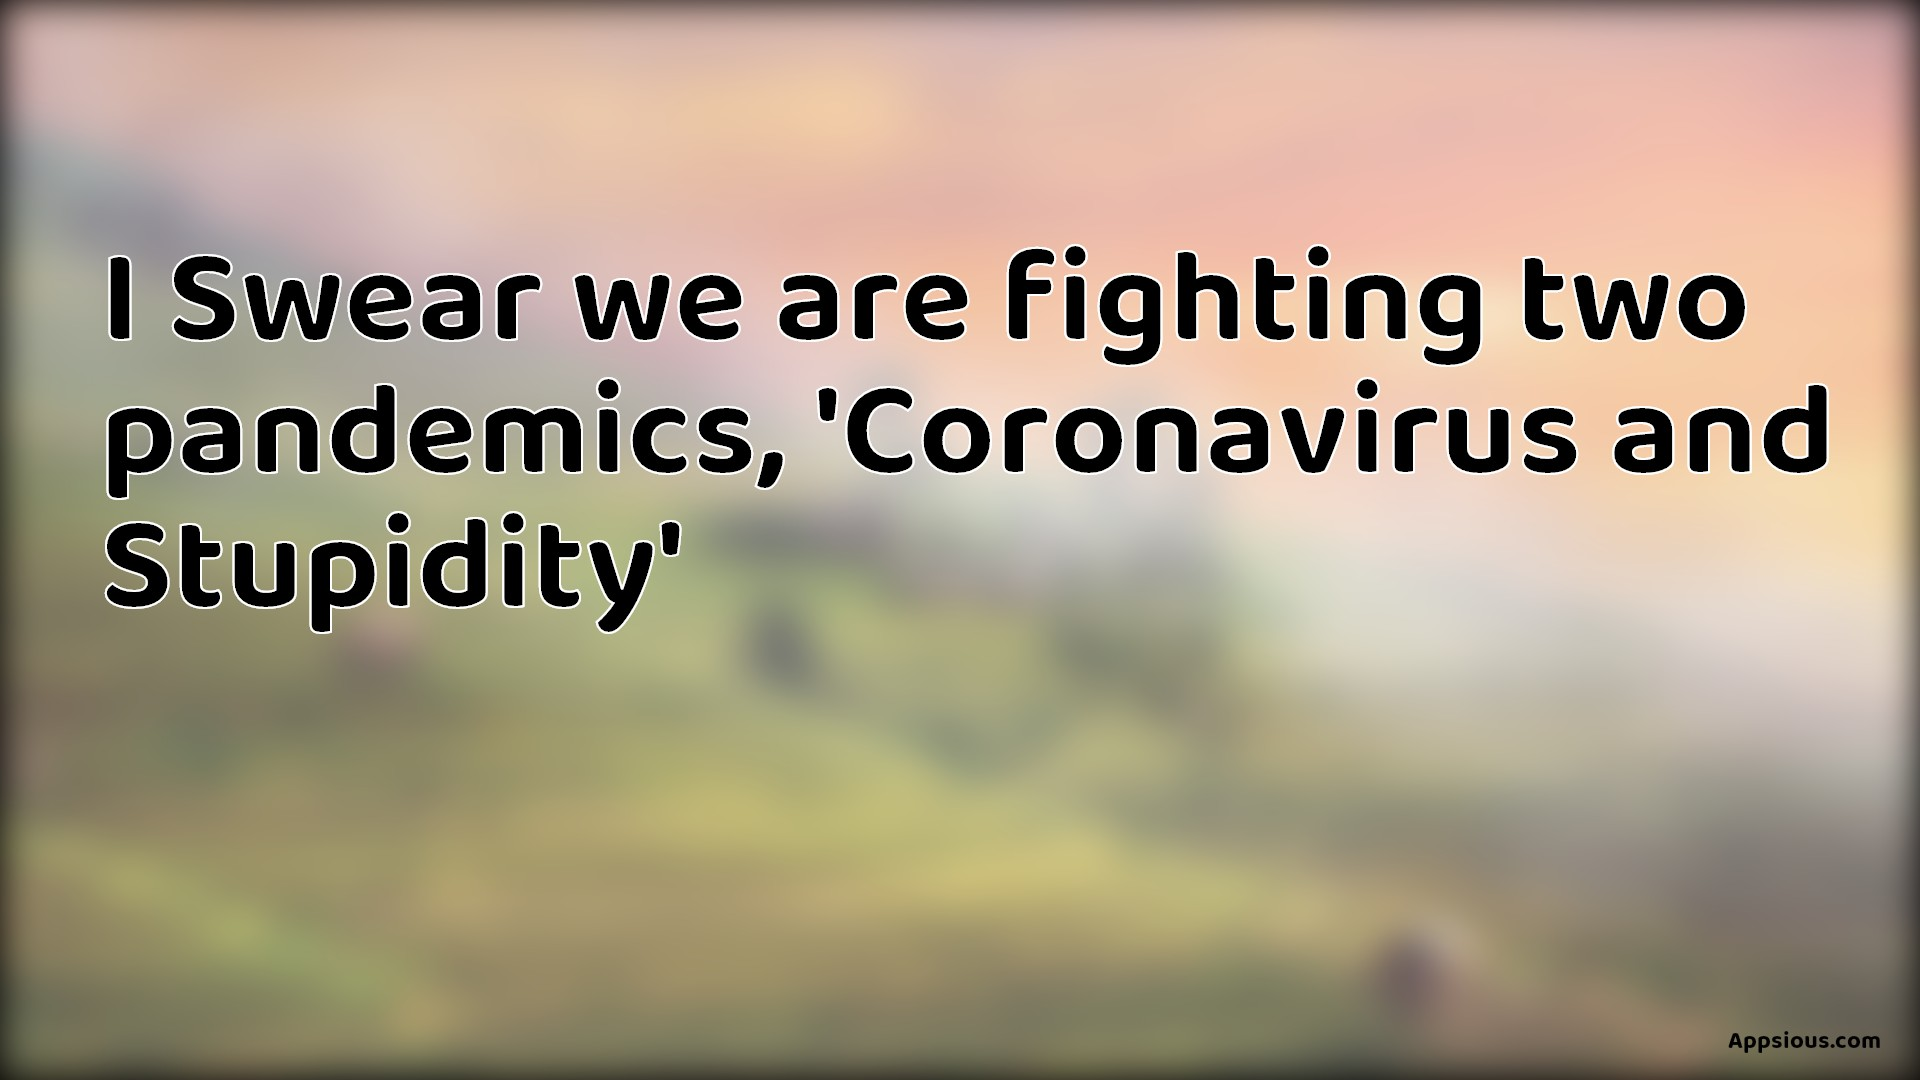 I Swear we are fighting two pandemics, 'Coronavirus and Stupidity'